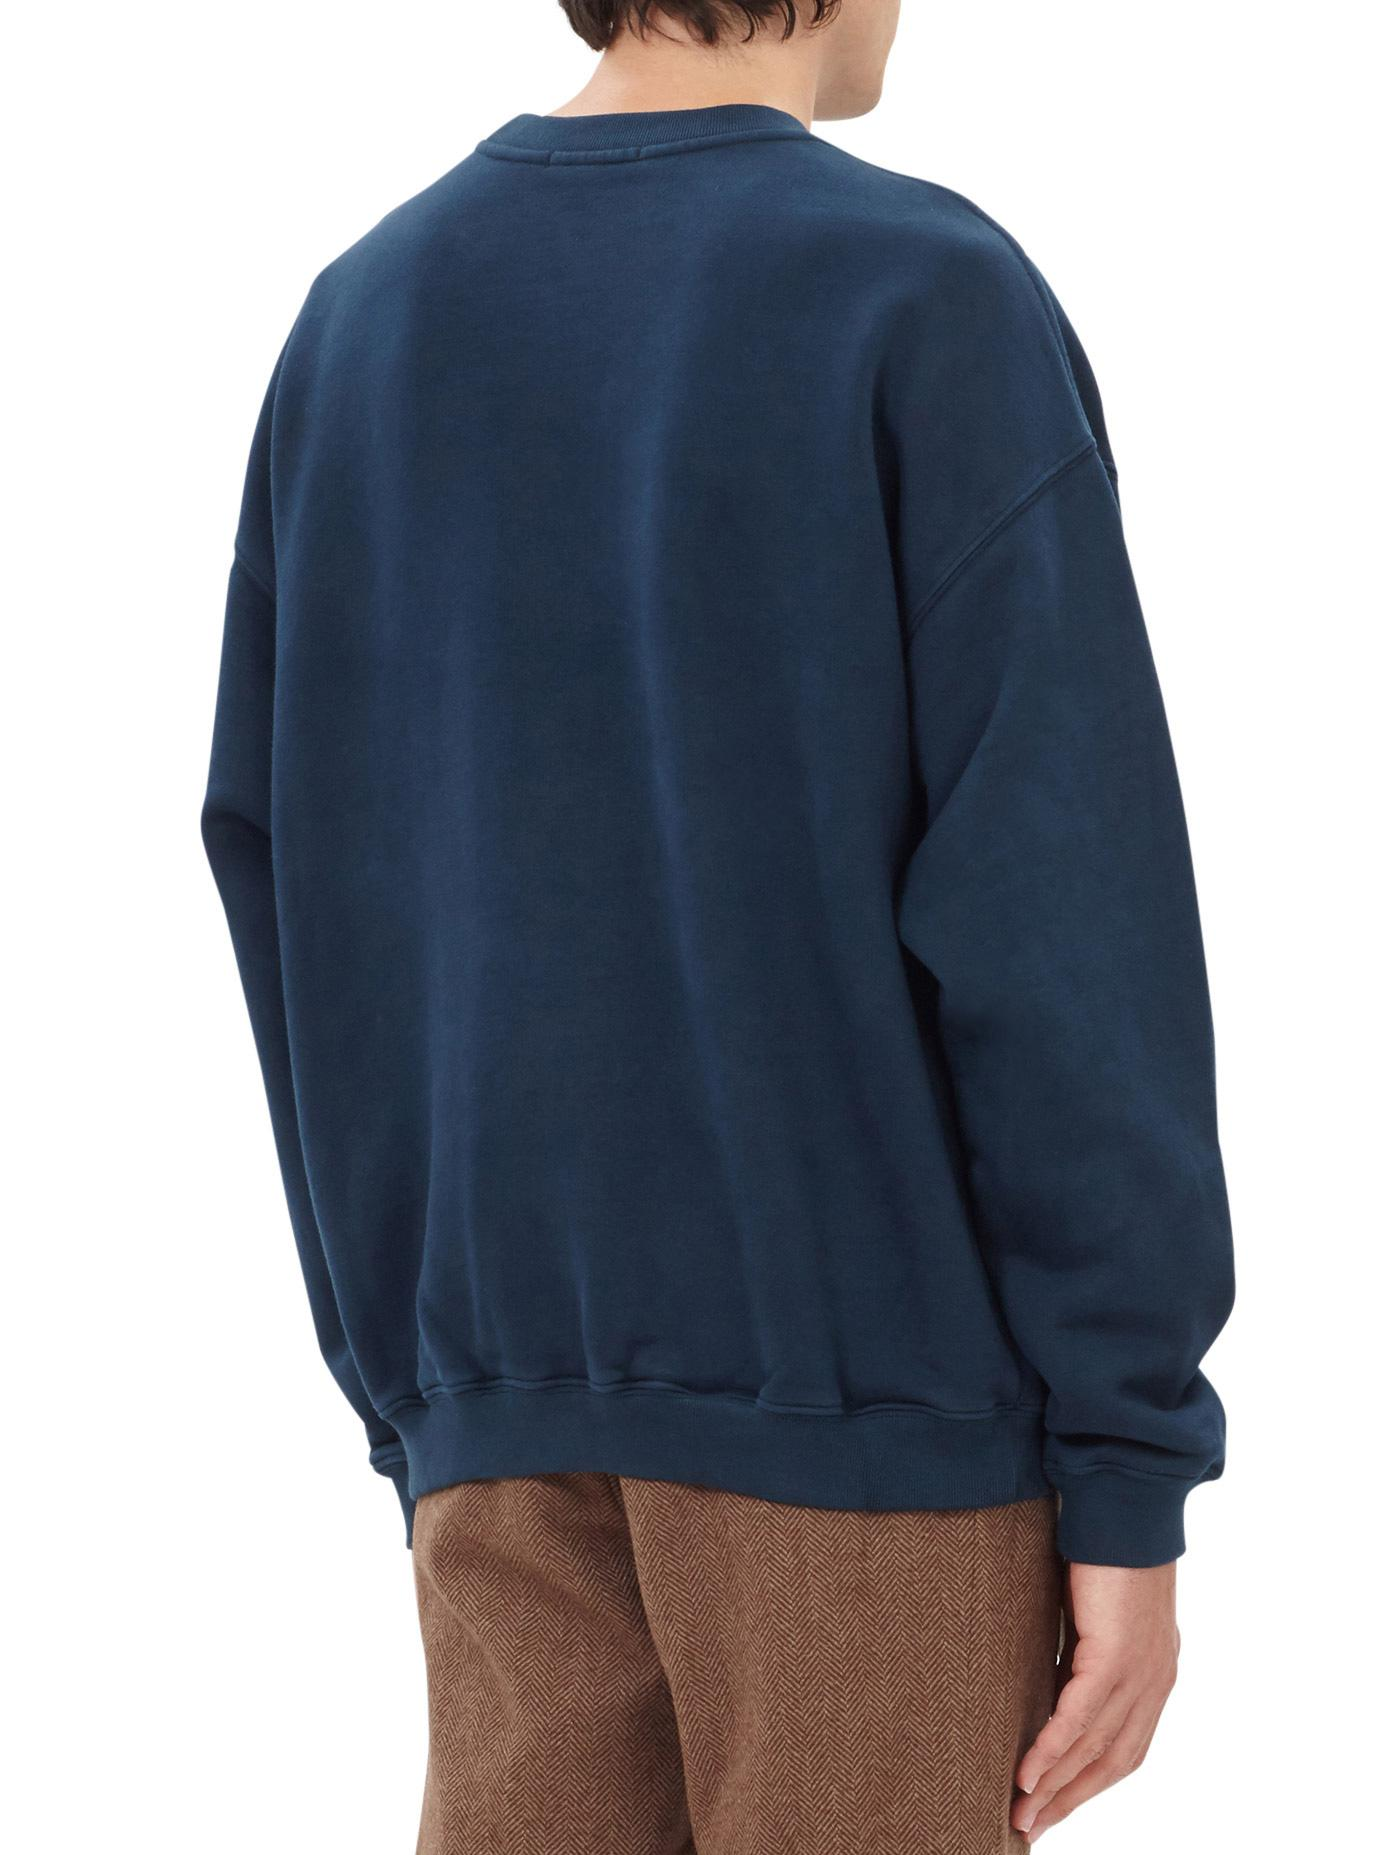 Yeezy Cotton Boxy Zip Hoody in Blue for Men